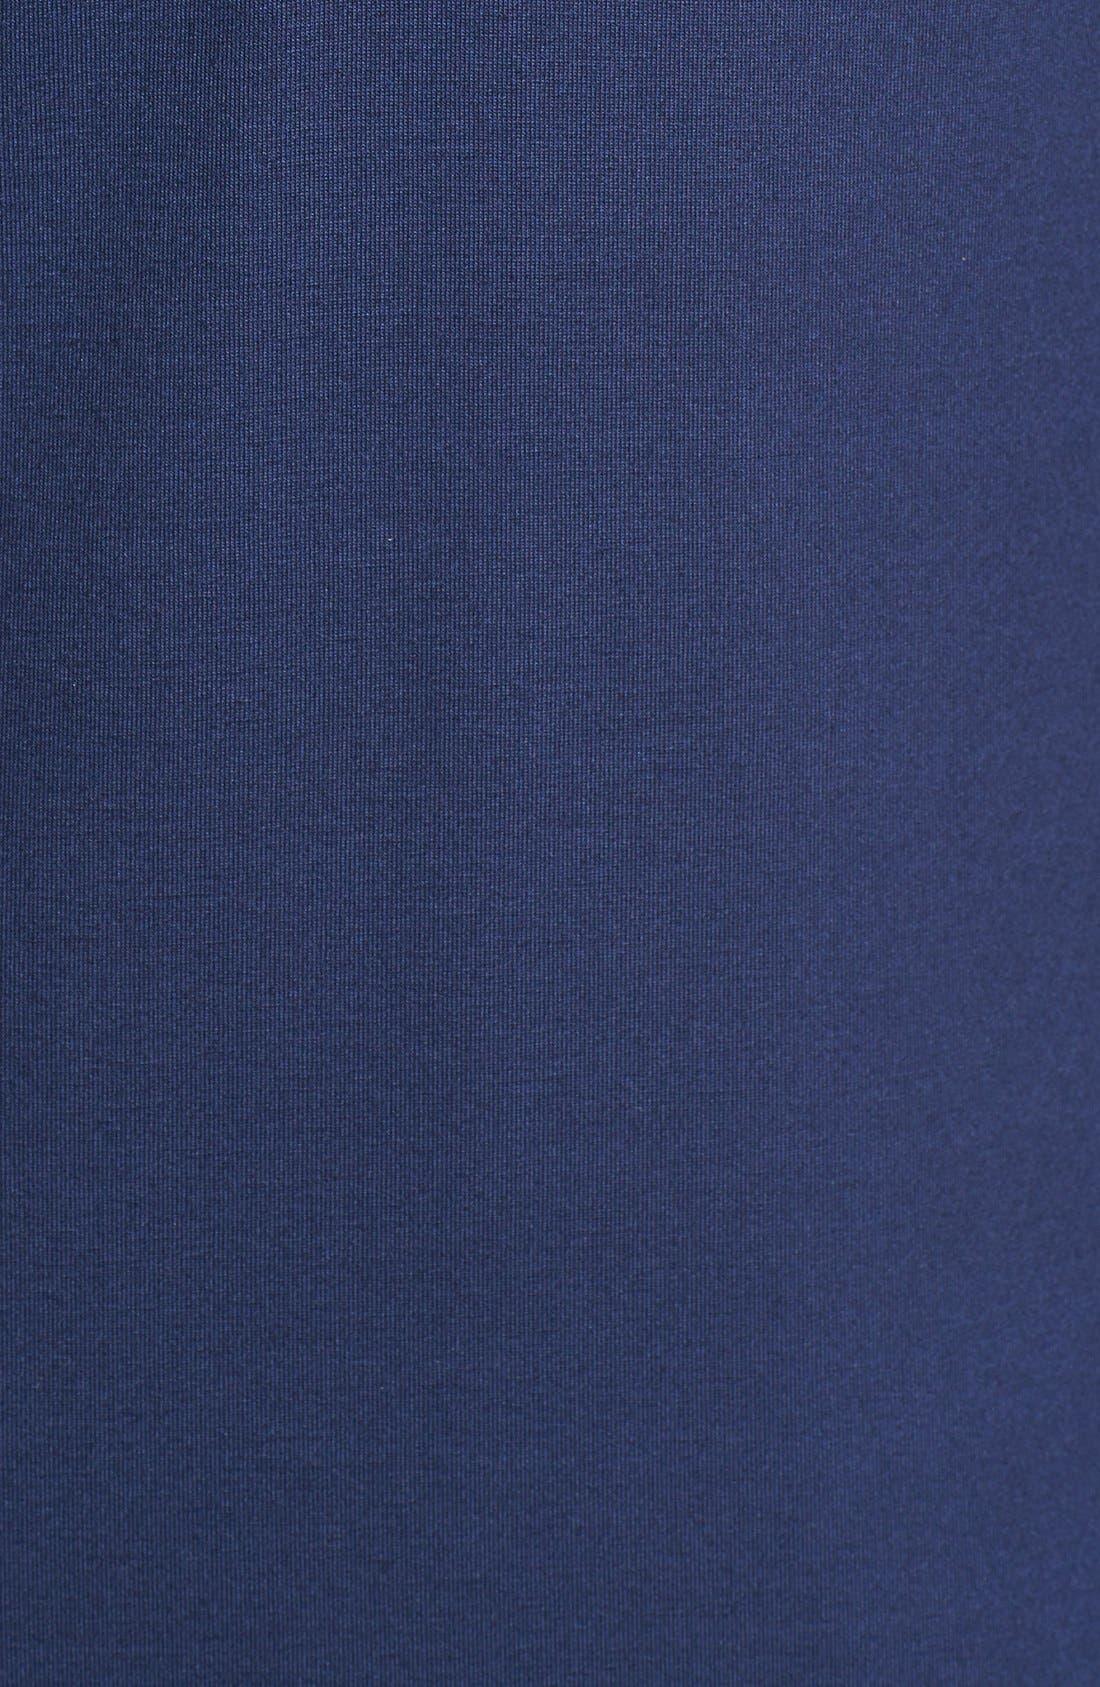 Alternate Image 3  - Trina Turk 'Lanna' Jersey T-Shirt Dress